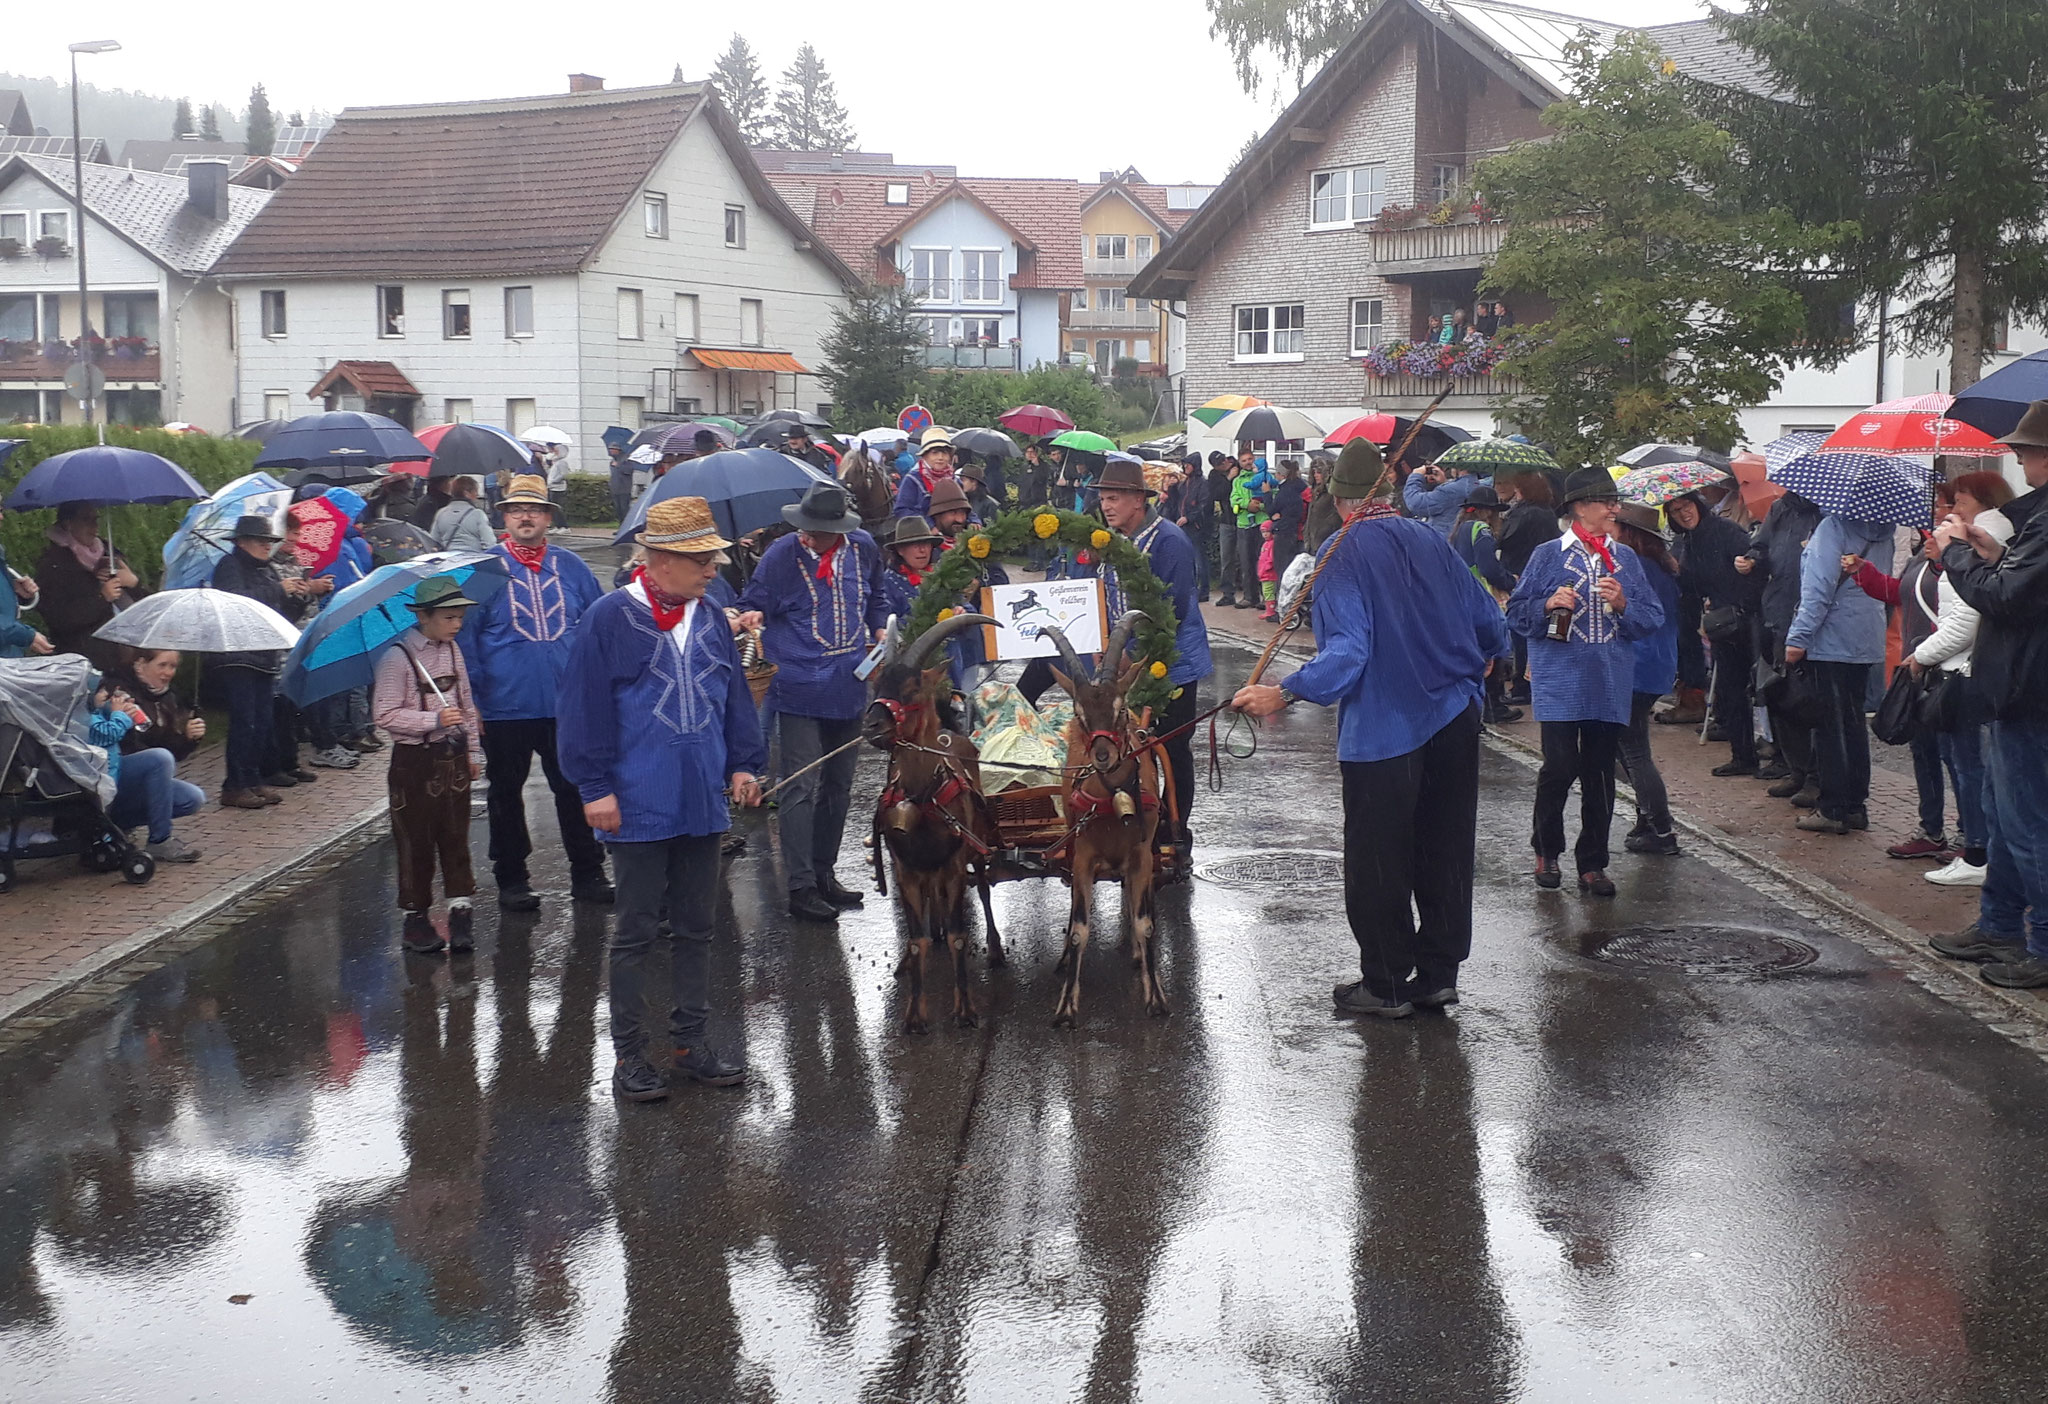 Umzug beim Roßfest in St. Märgen